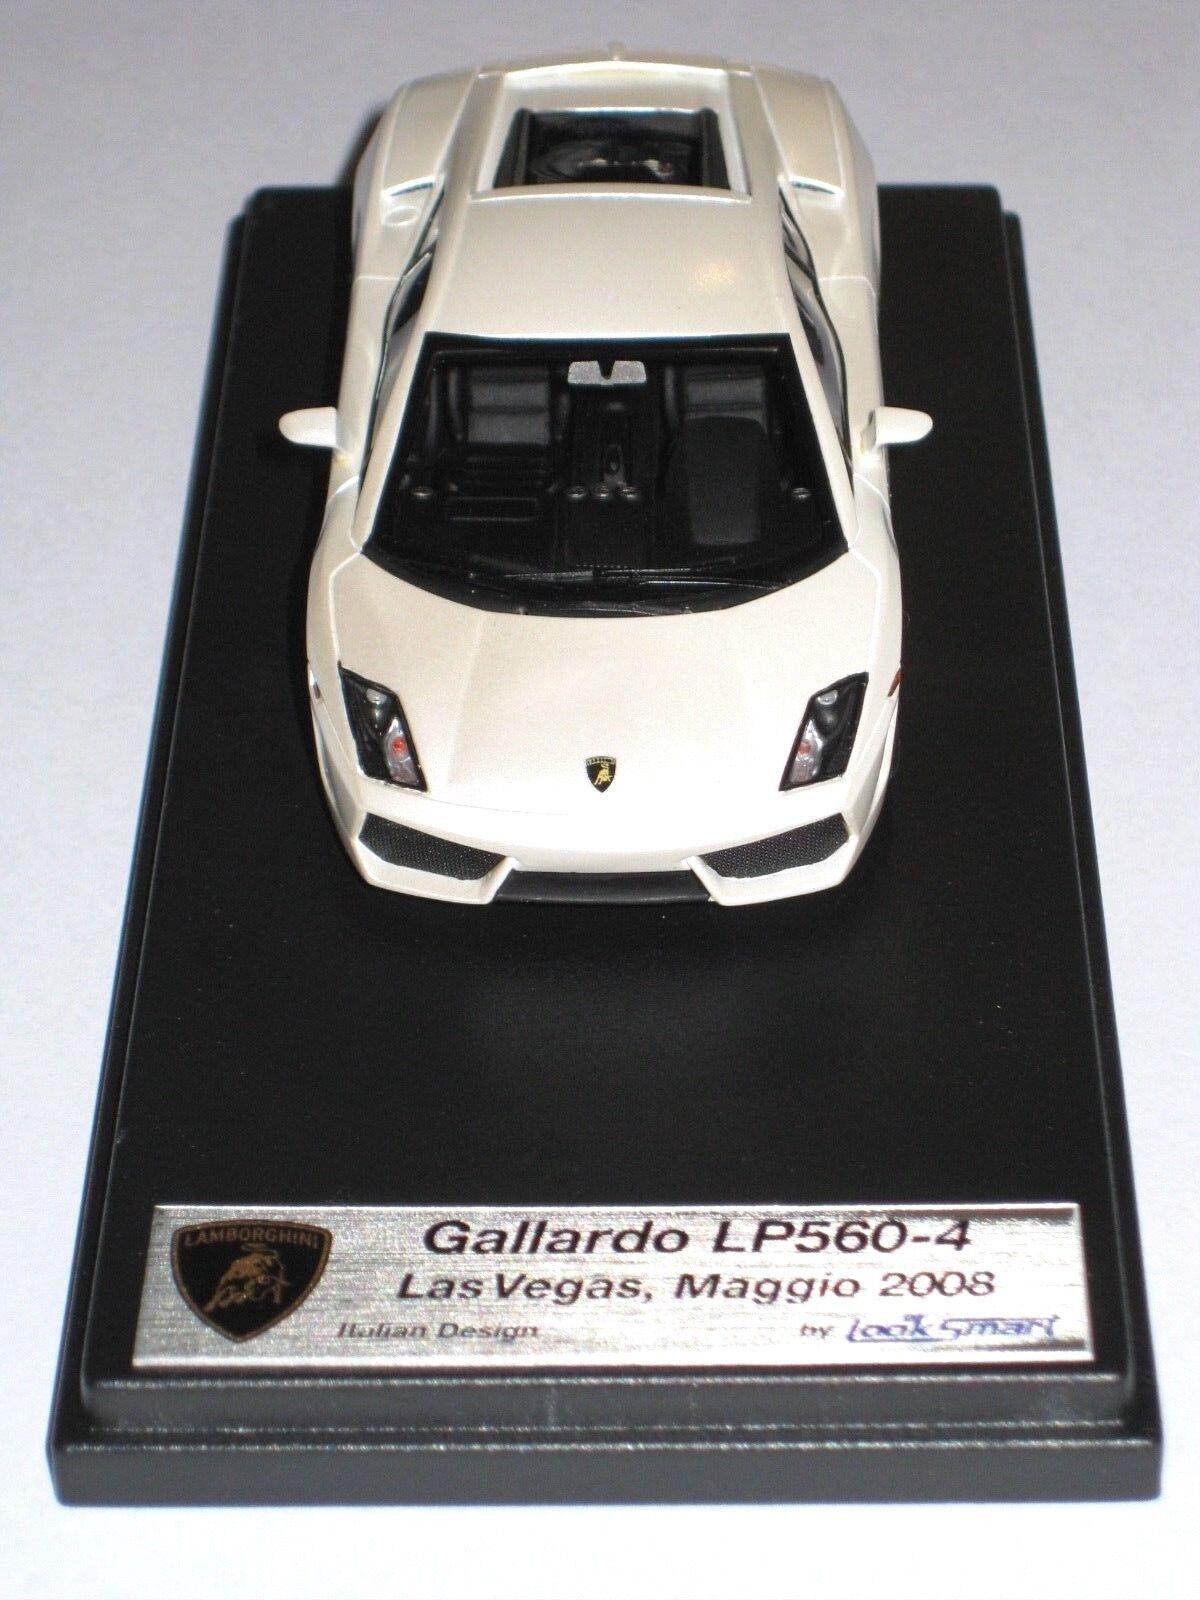 Lamborghini gallardo lp560-4 start   presse   modell looksmart 2008 modell 1 43 selten